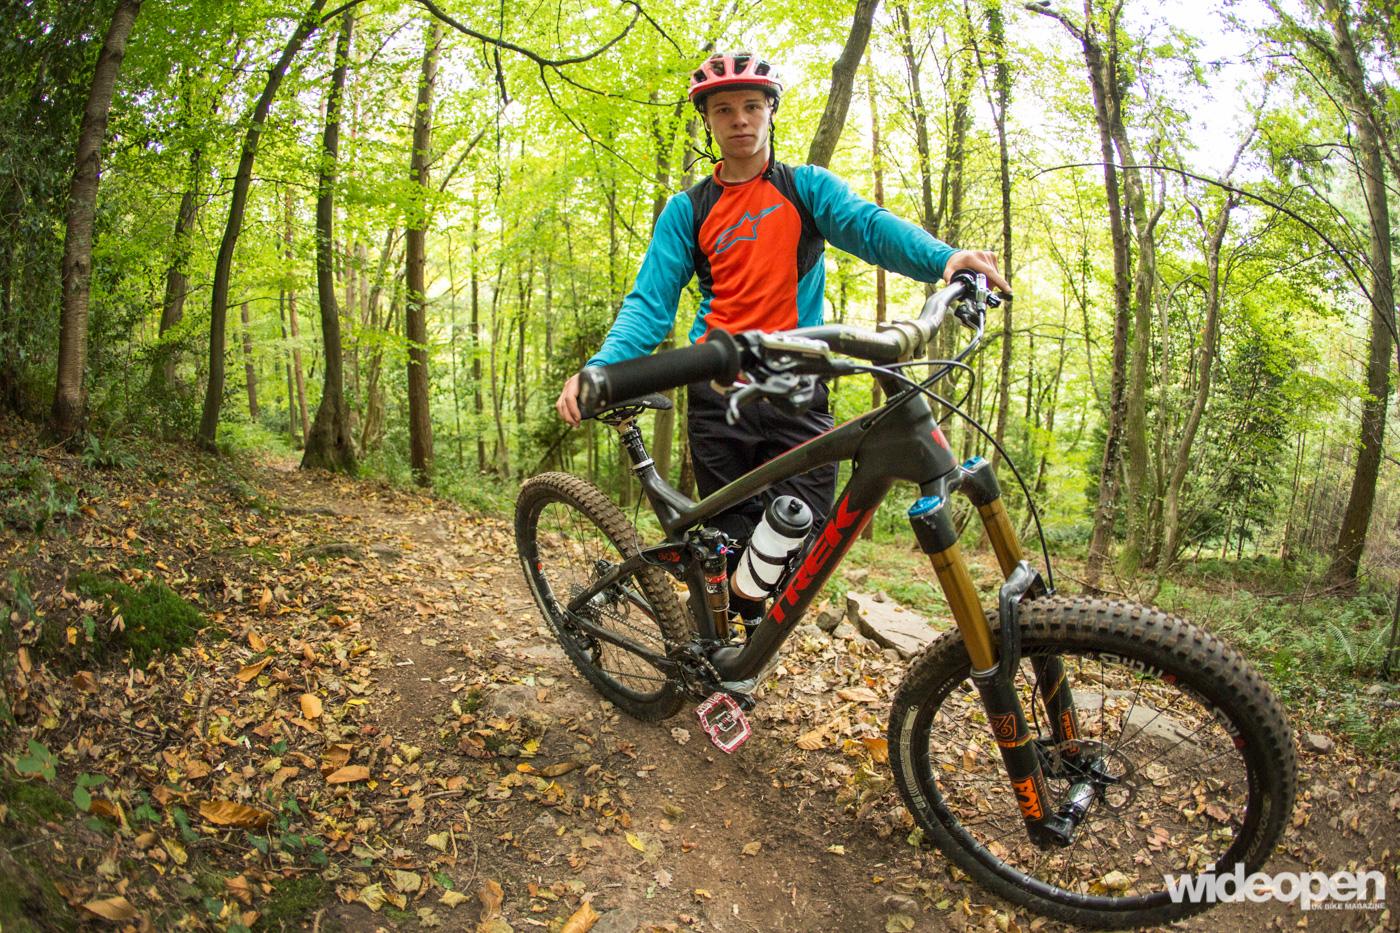 Laurie Greenland Trek trail bike Leigh Woods Bristol for Wideopenmag interview